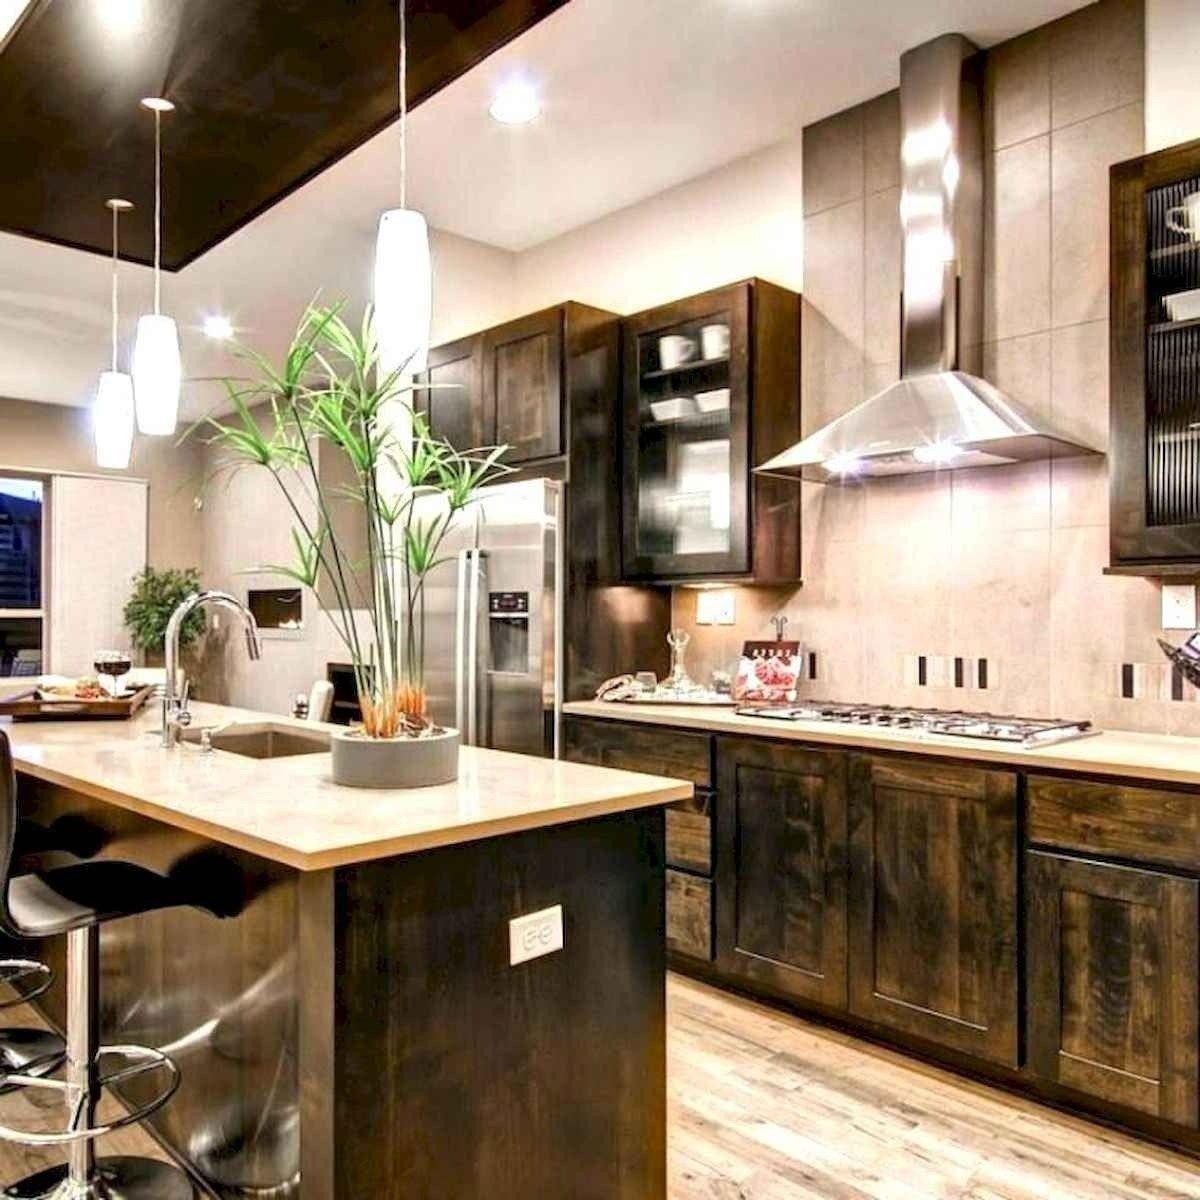 56 Rustic Modern Farmhouse Kitchen Decor Ideas And Remodel